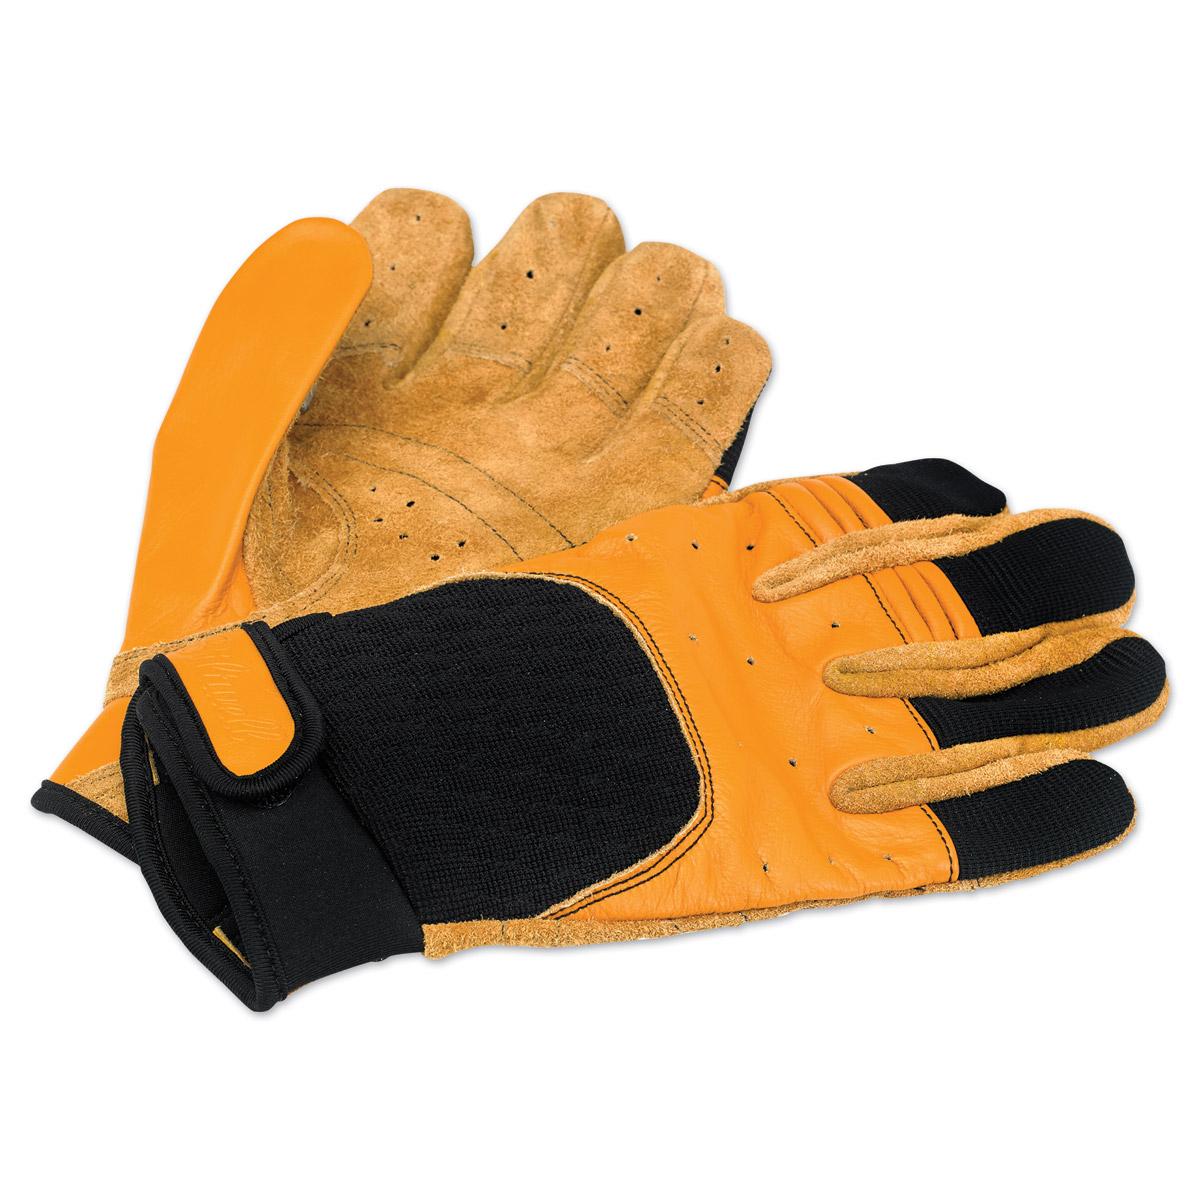 Biltwell Inc. Tan/Black Bantam Gloves